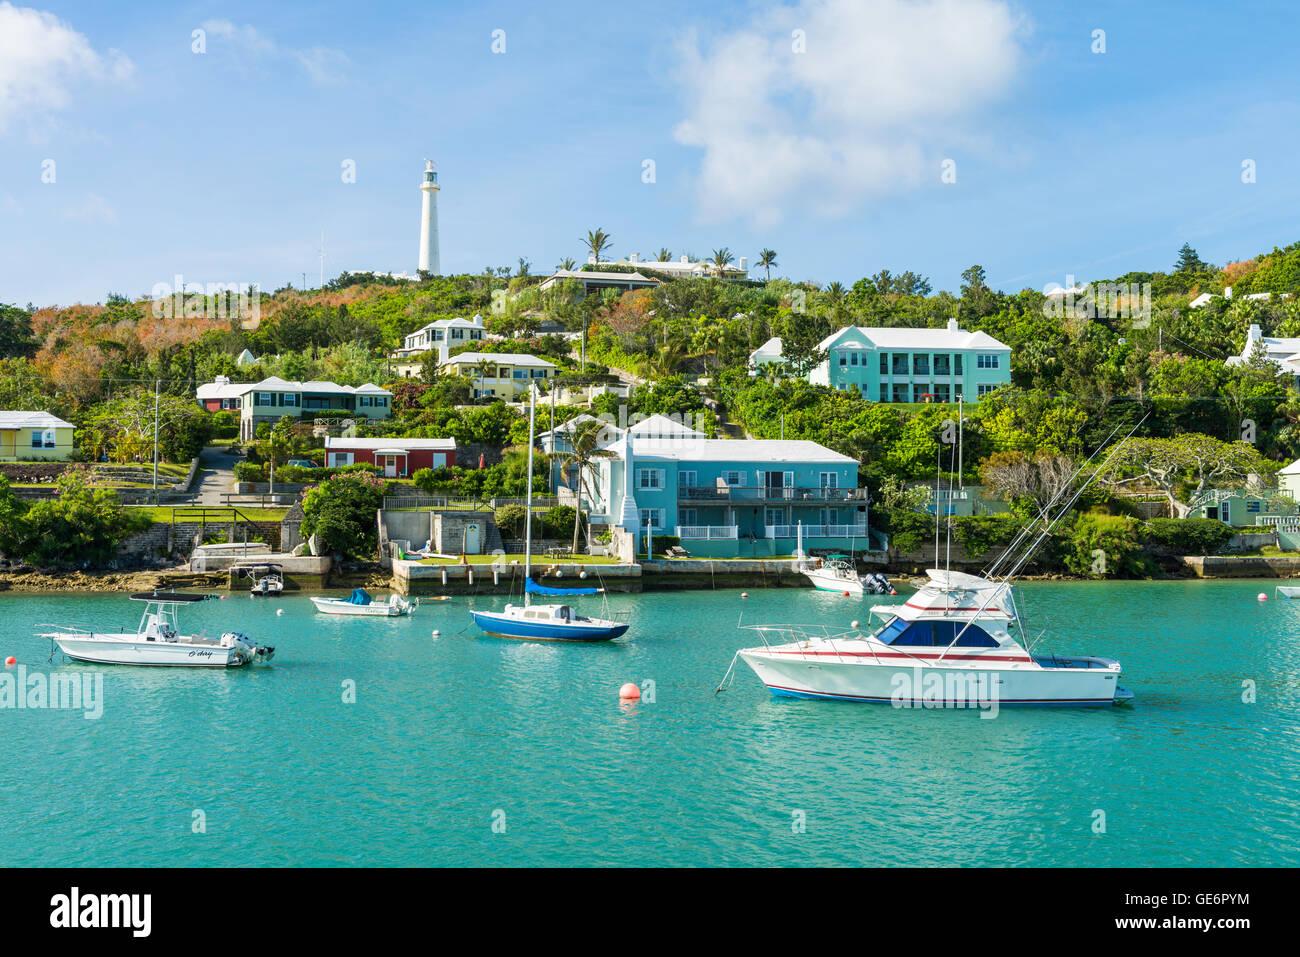 Pleasure boats in Jew's Bay, Bermuda, with Gibbs Hill Lighthouse behind, Southampton Parish, Bermuda - Stock Image